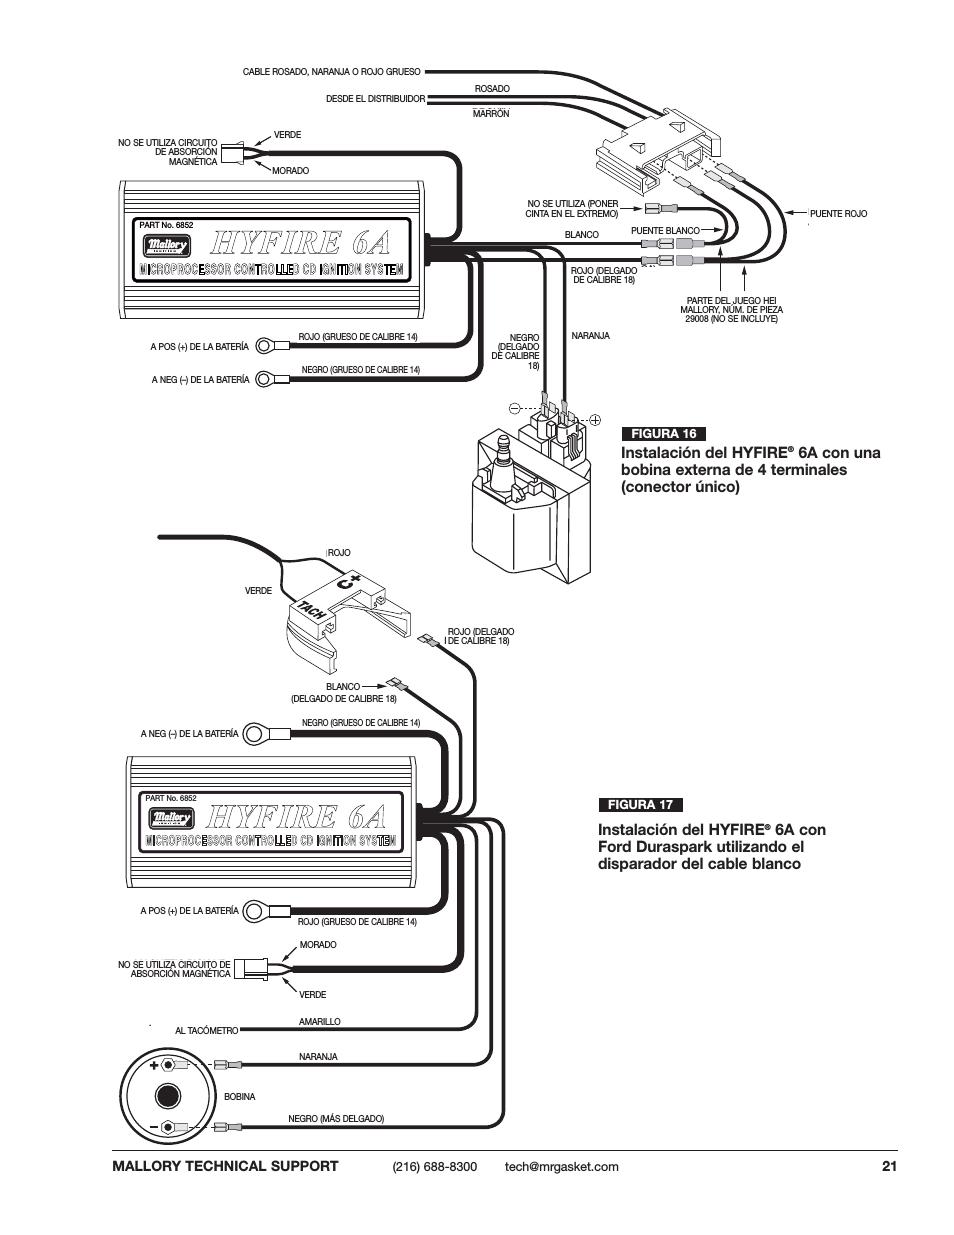 Mallory Hyfire 6a Wiring Diagram